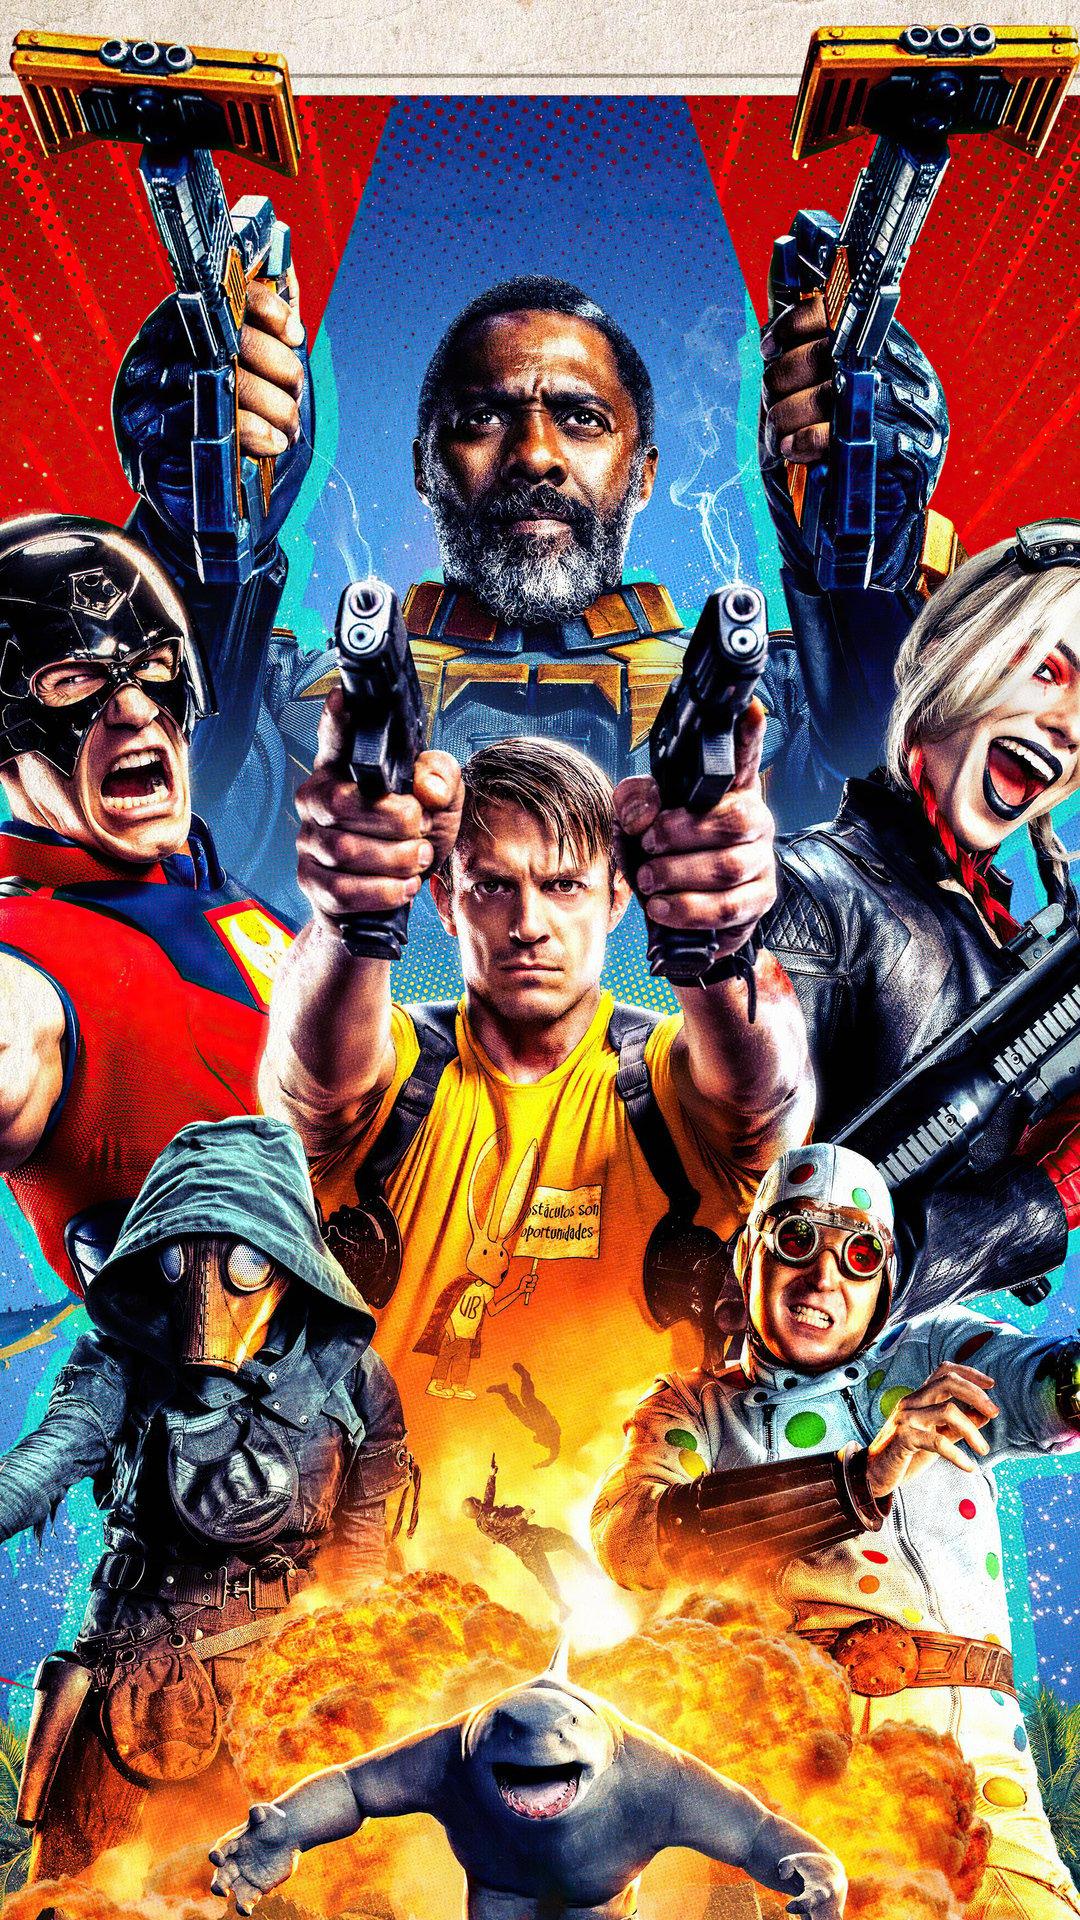 The Suicide Squad Wallpapers   Top 35 Best Suicide Squad 2 1080x1920